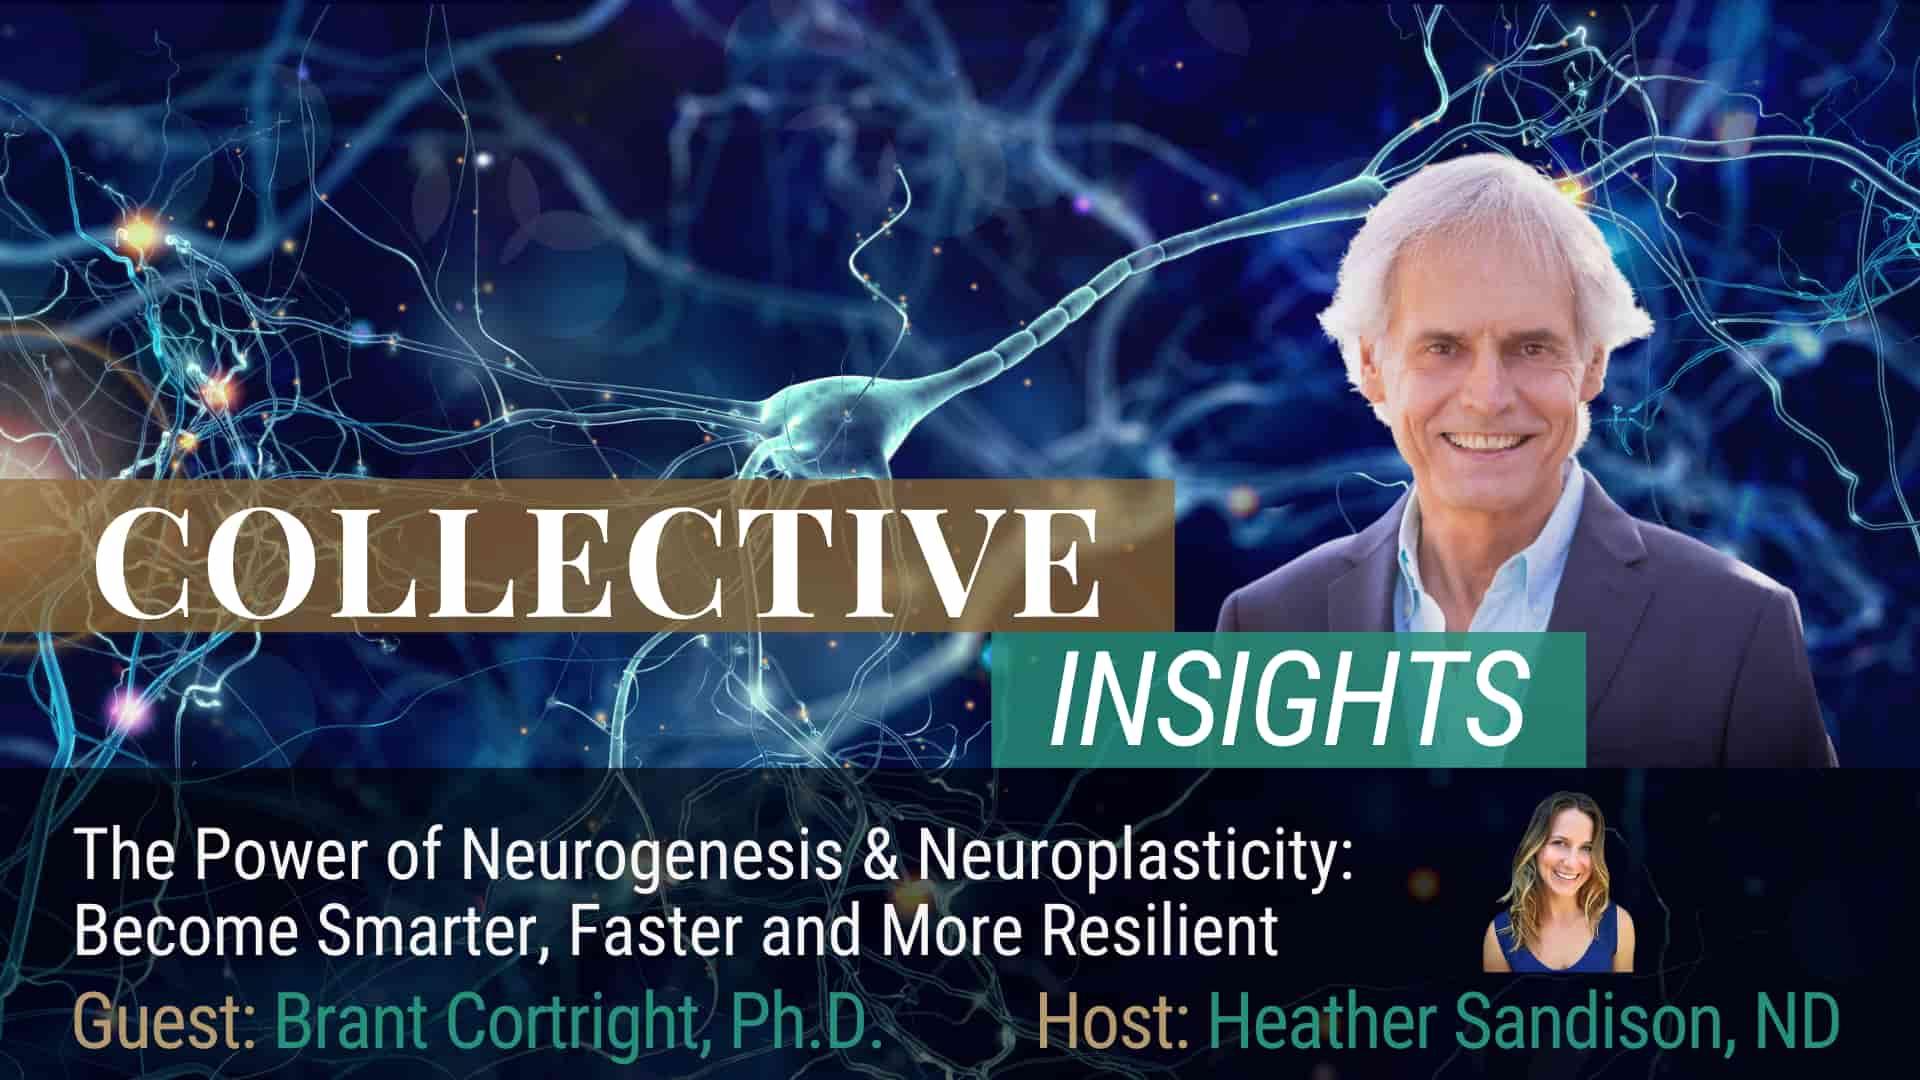 The Science of Neurogenesis - Brant Cortright, Ph.D. - Brain